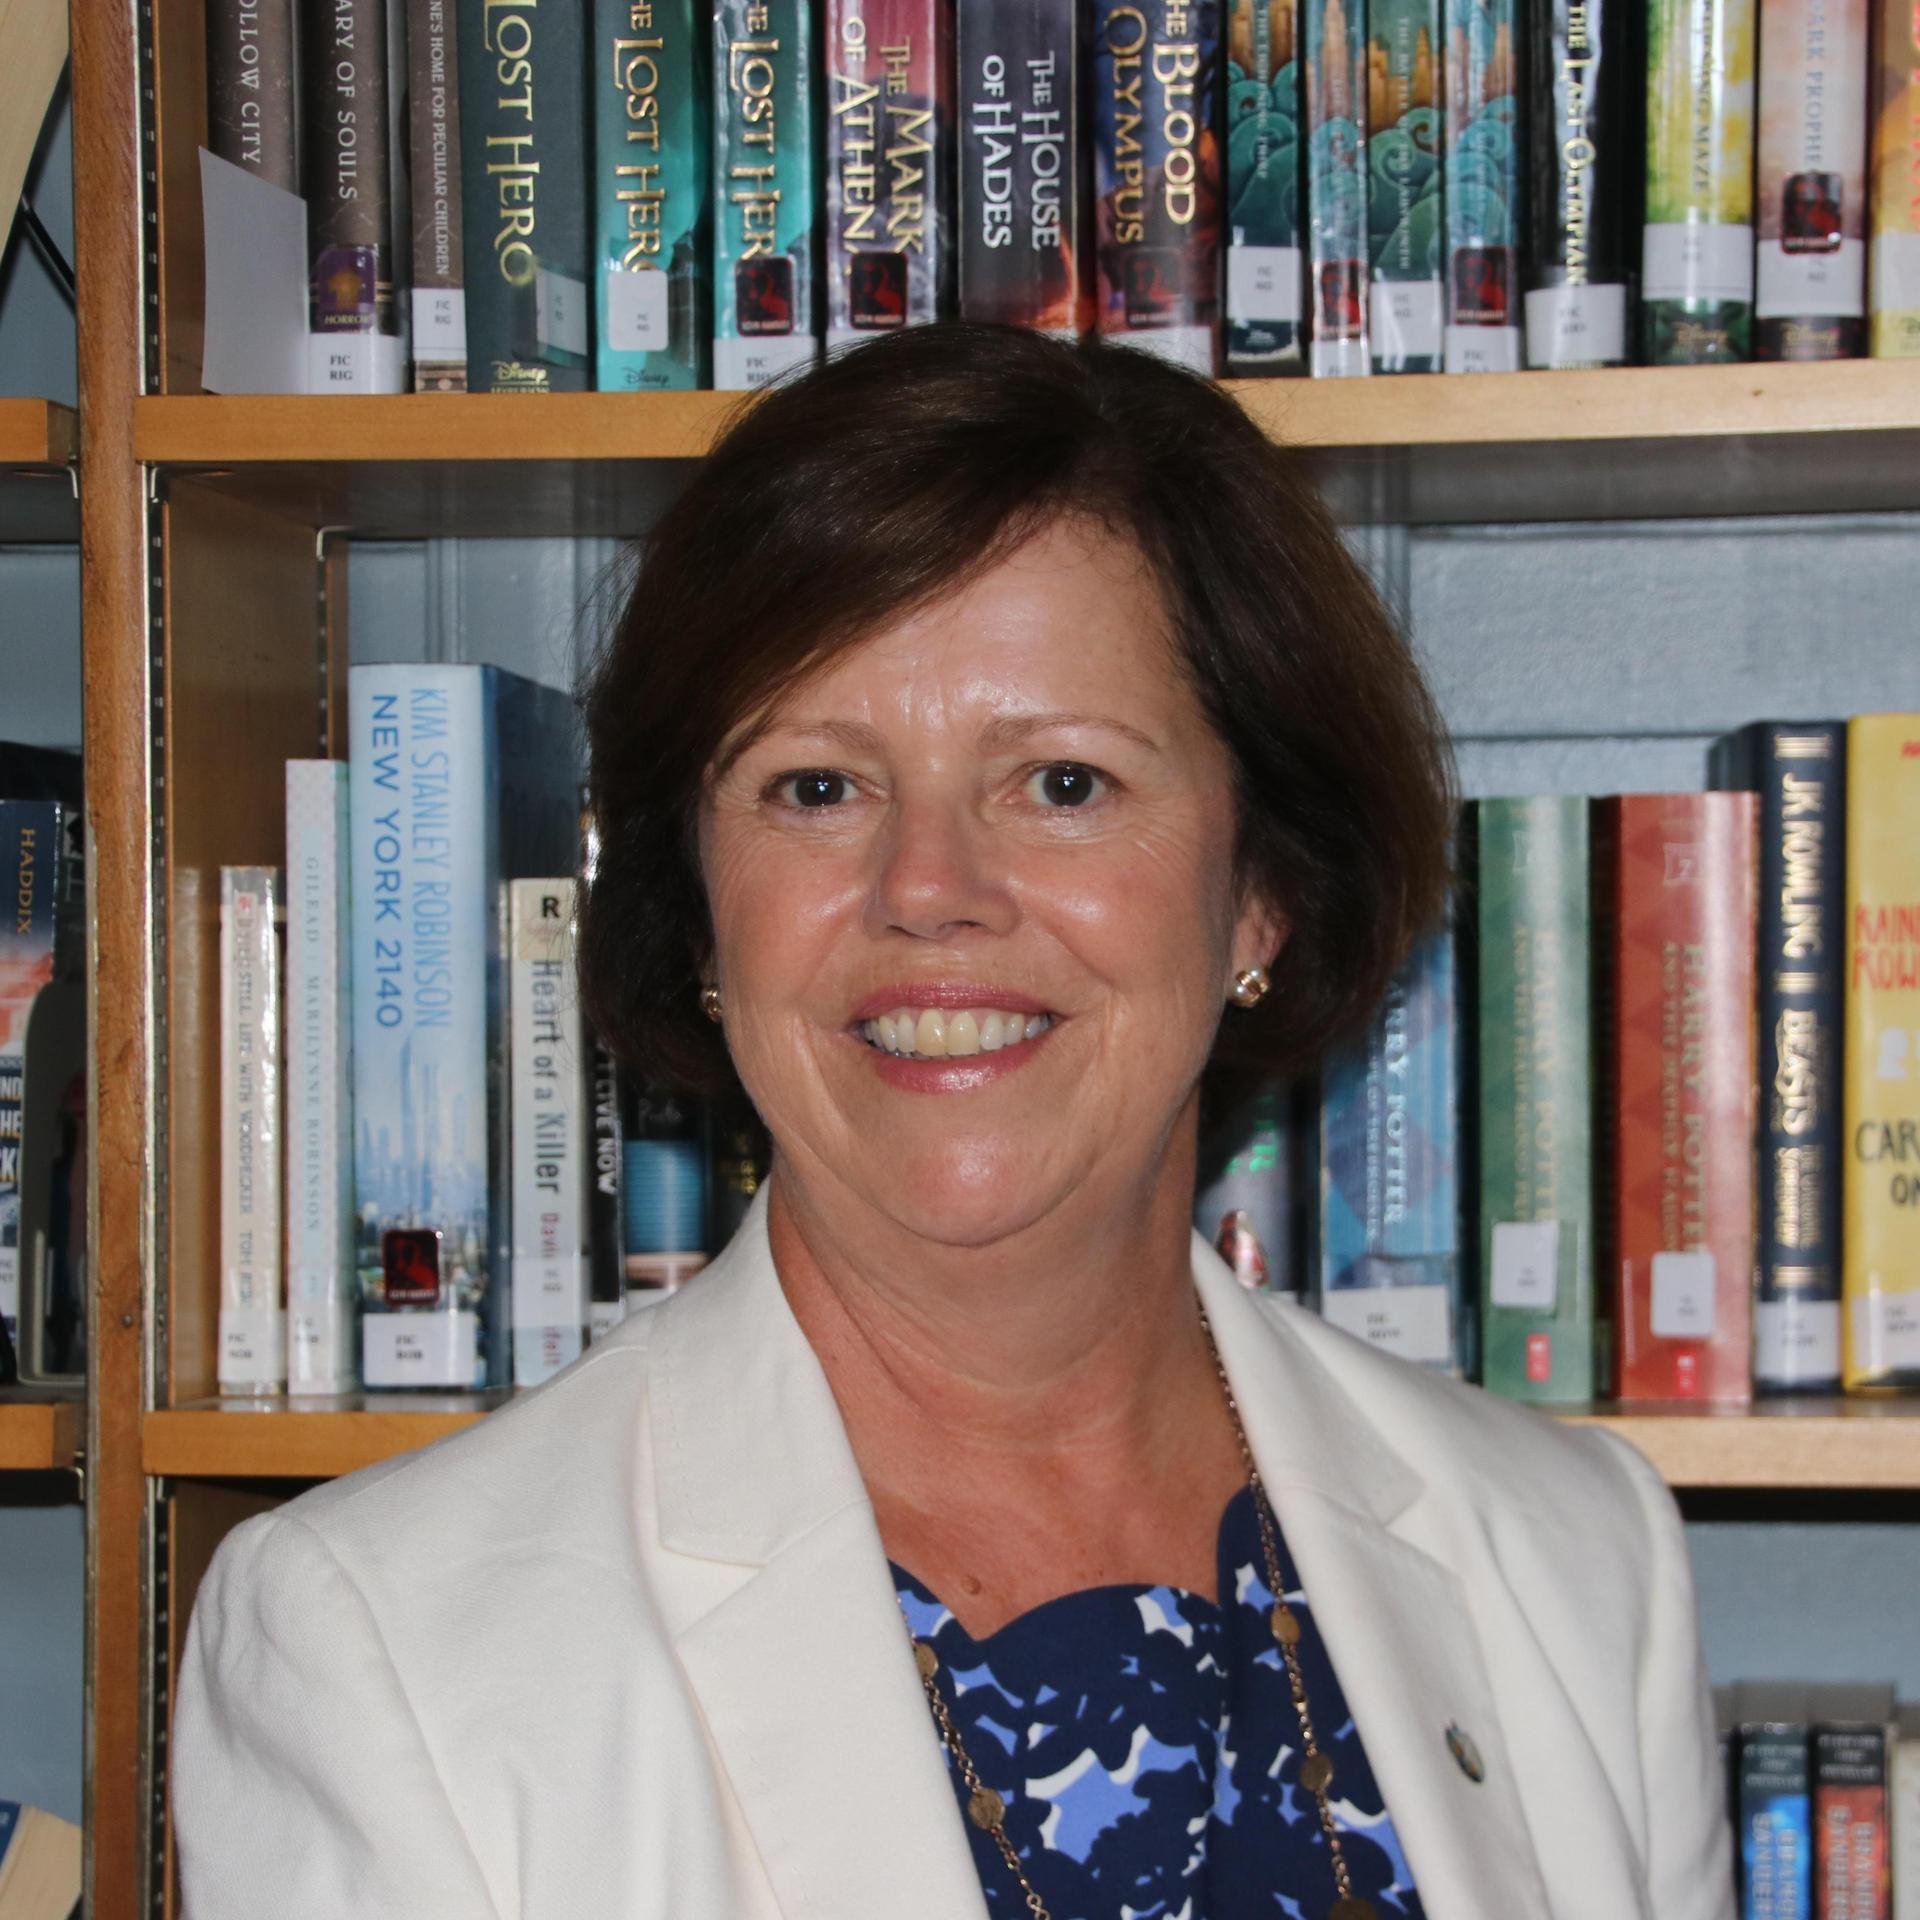 Rosemary J. Powers